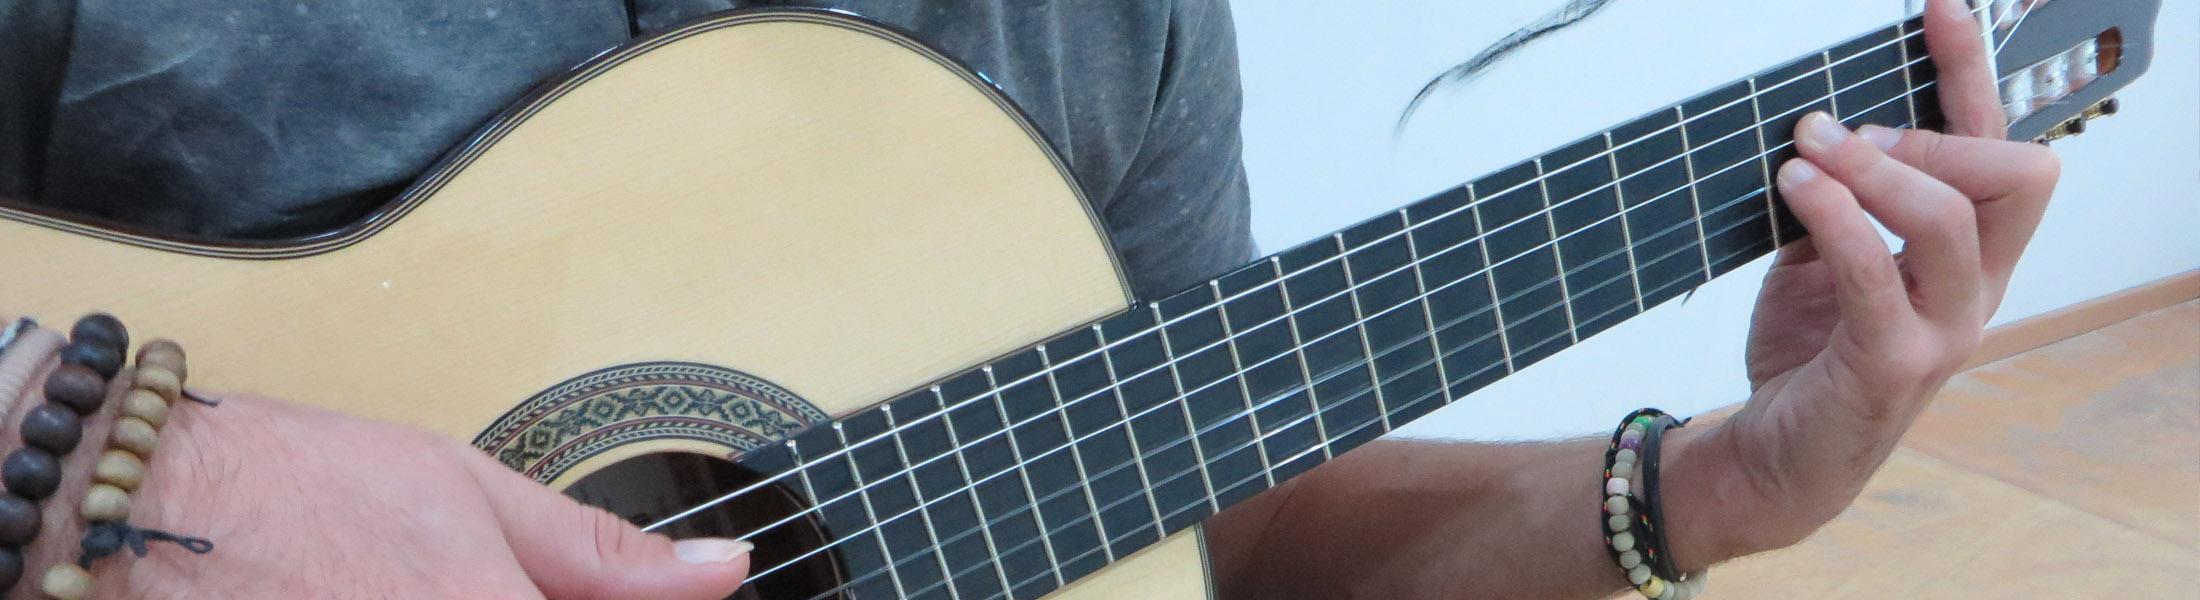 clases de guitarra en Valencia